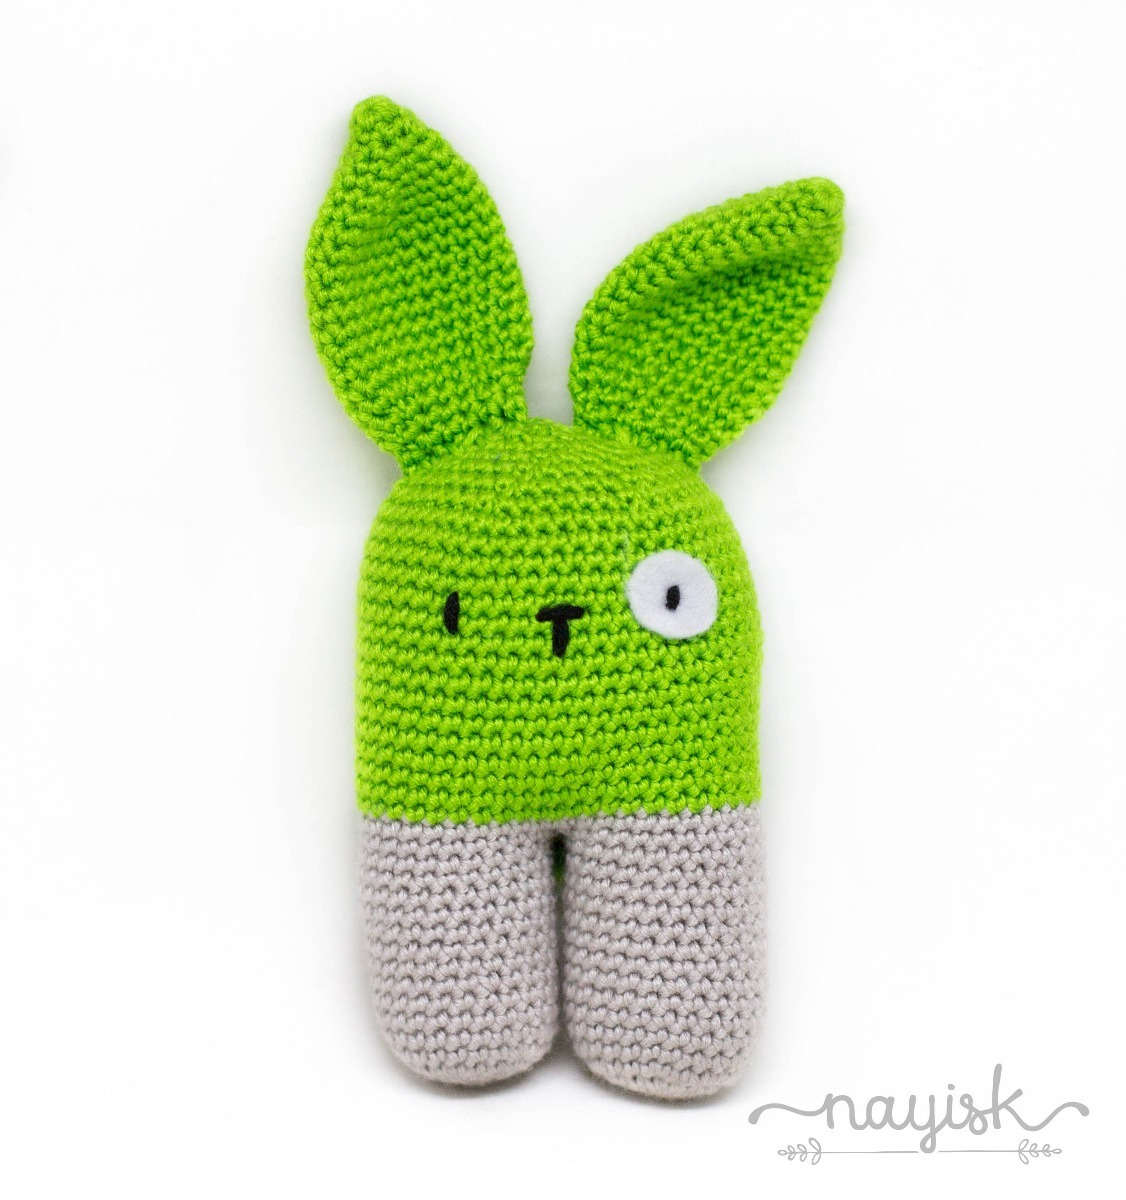 37a4ba07b Amigurumi Sonaja Crochet Ganchillo Conejo Bipedo Verde Limon